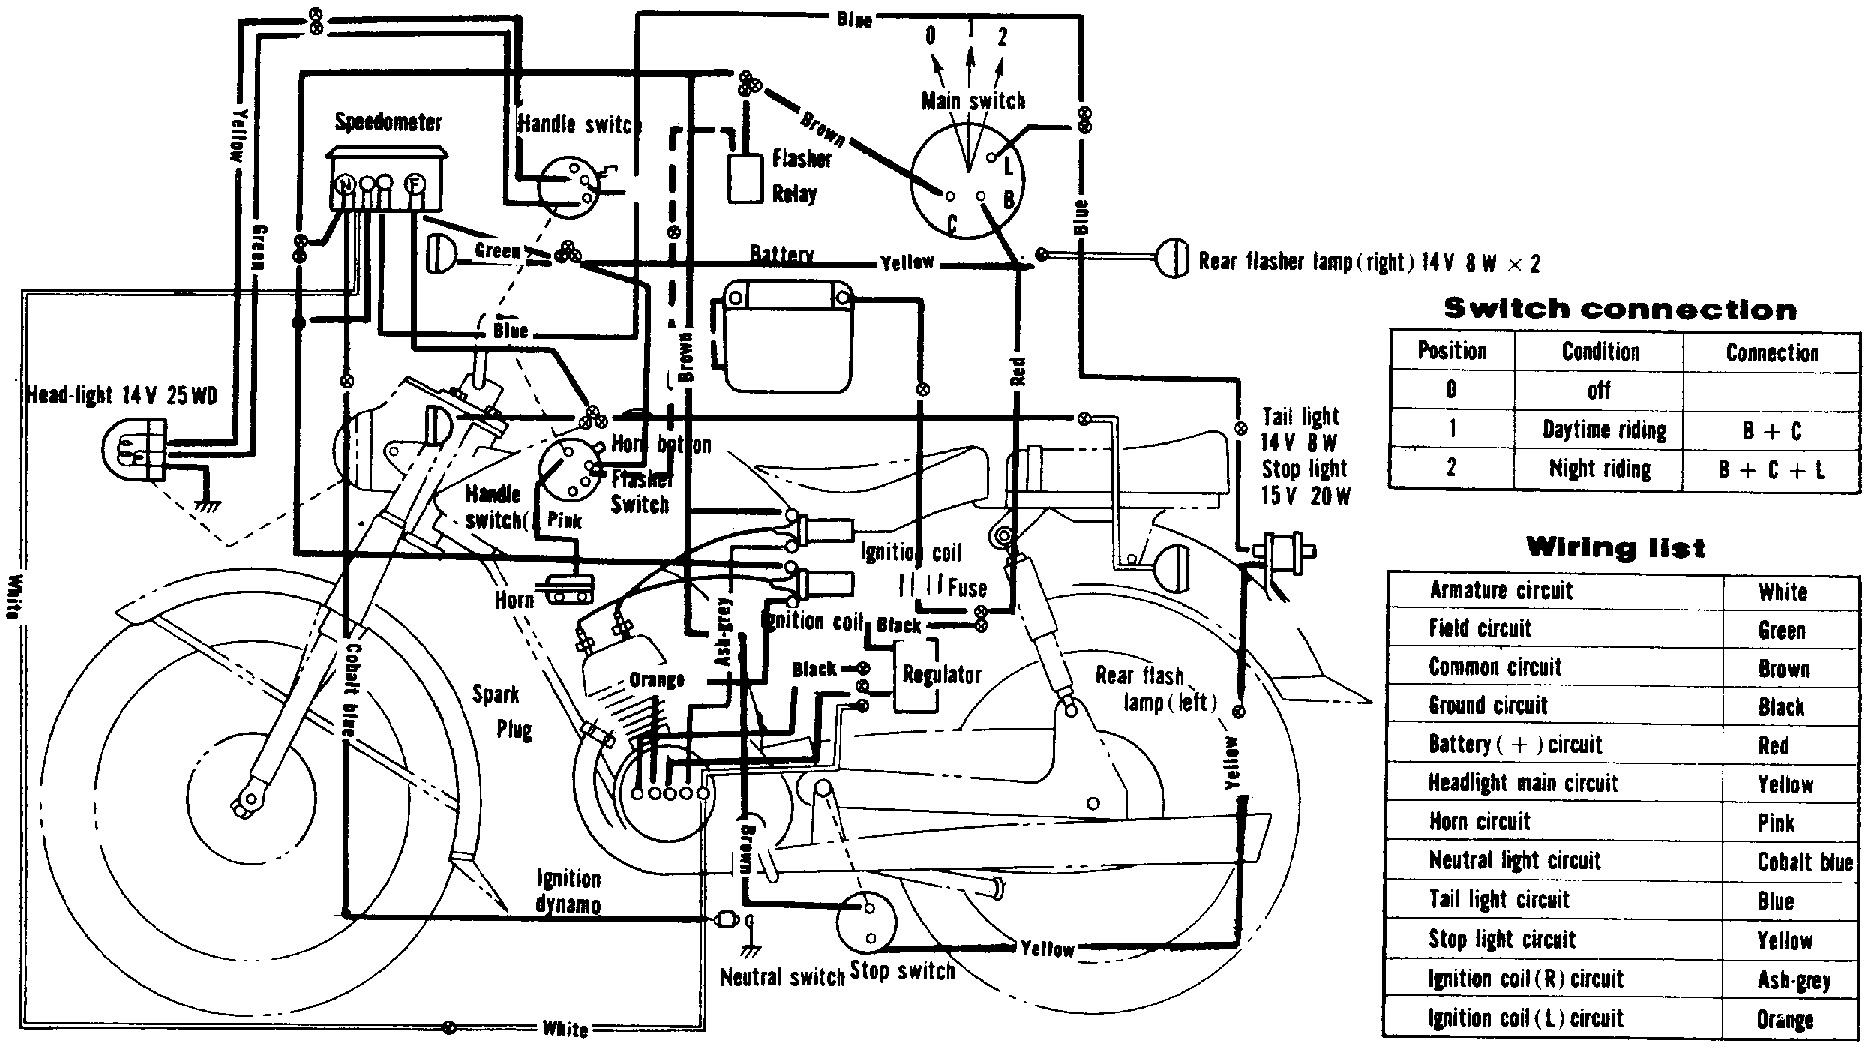 hight resolution of yamaha l2 wiring diagram wiring diagrams for arctic cat wiring diagram yamaha l2 wiring diagram